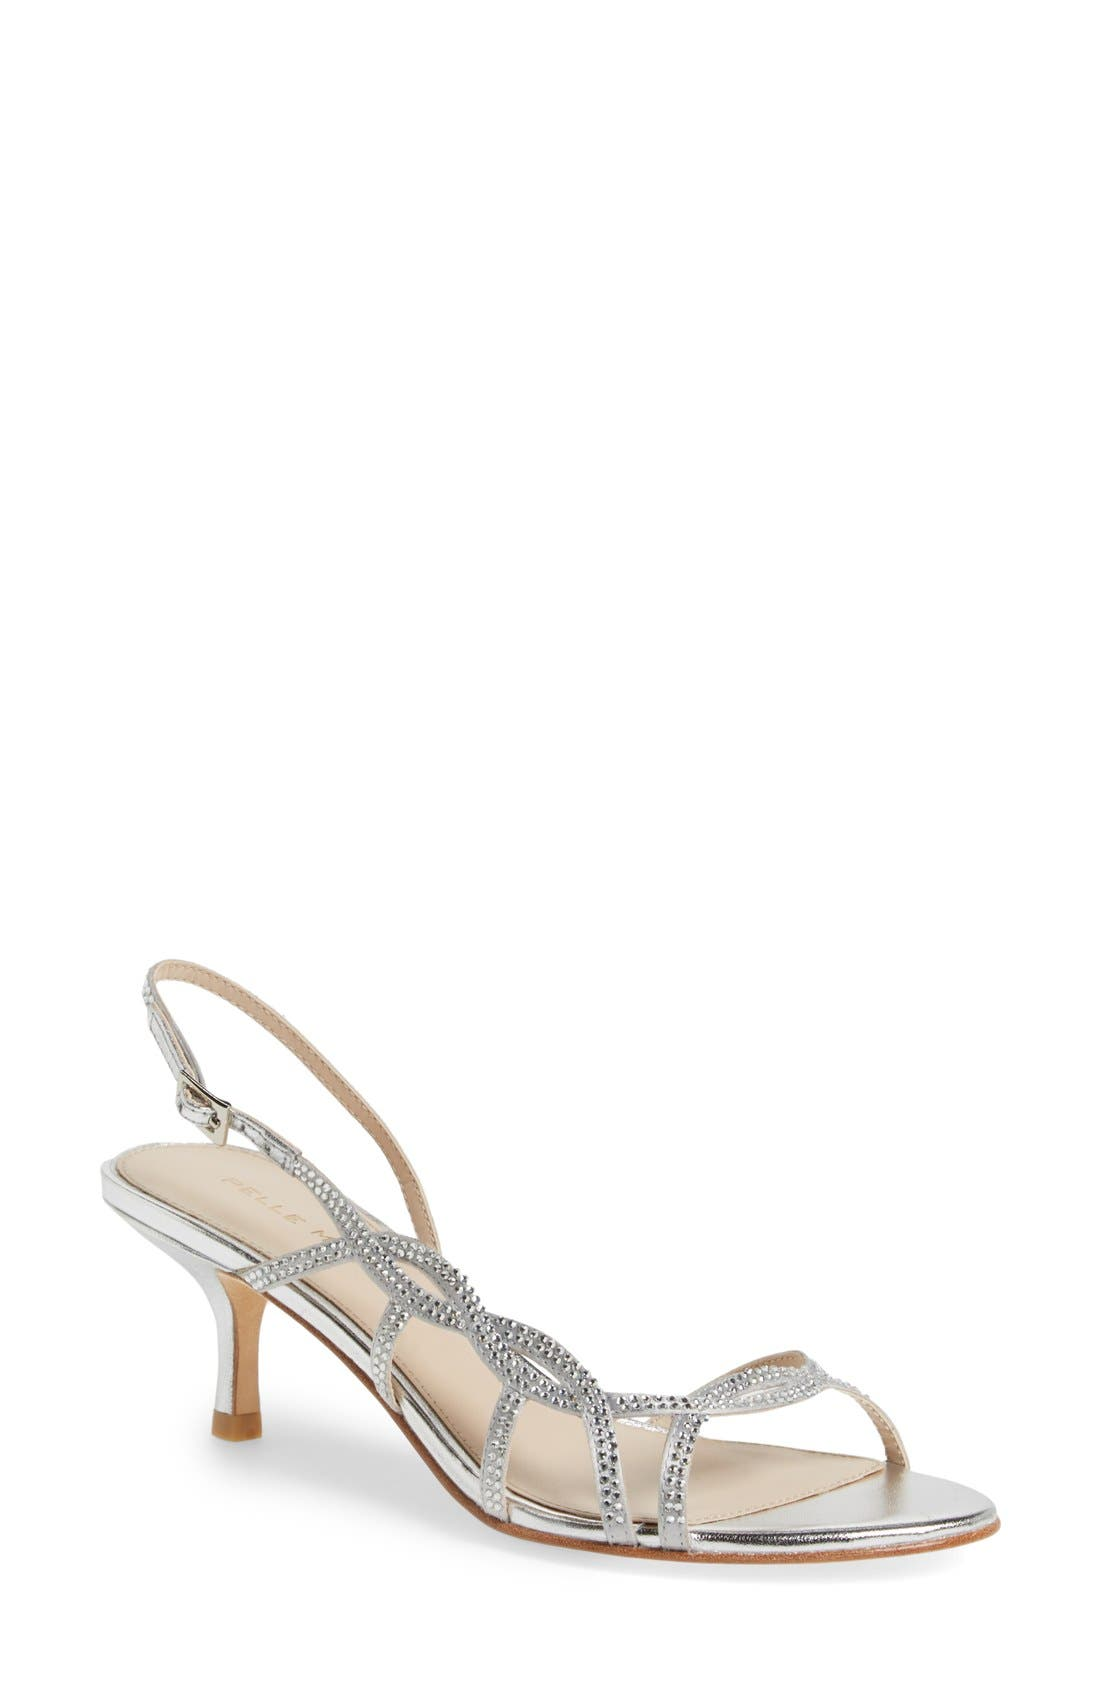 Alternate Image 1 Selected - Pelle Moda 'Amina' Metallic Slingback Sandal (Women)